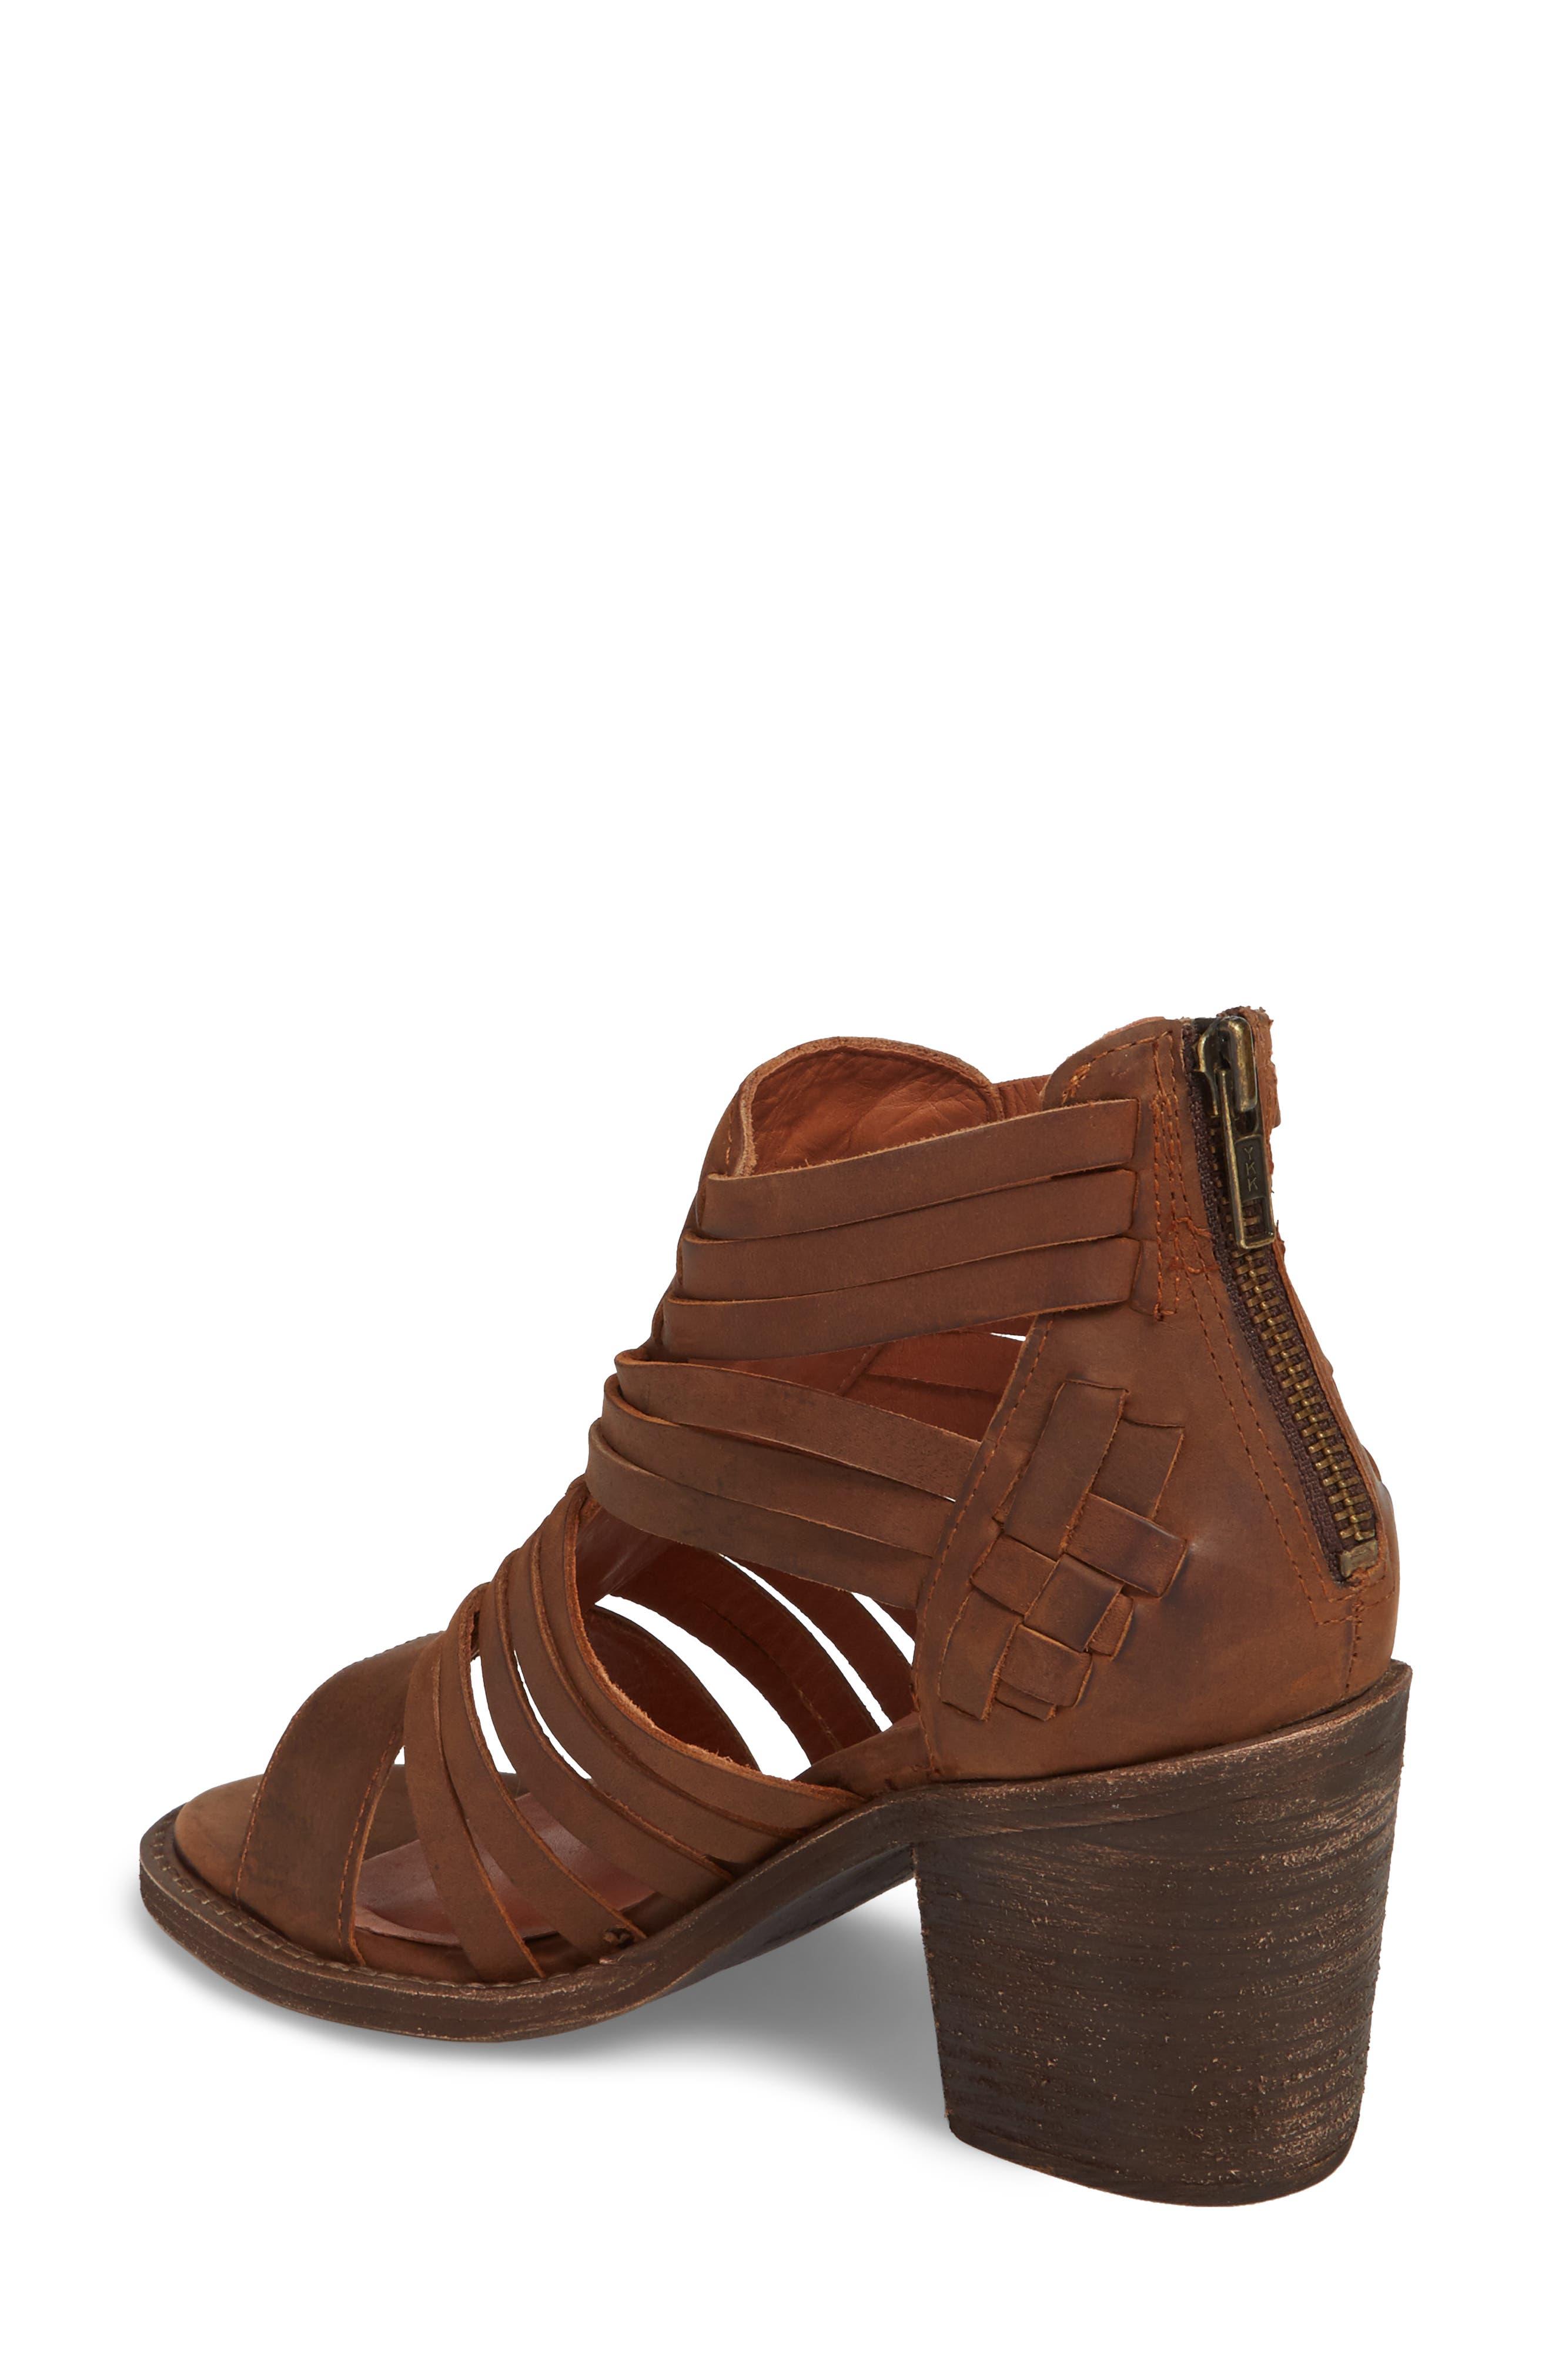 Felice Sandal,                             Alternate thumbnail 2, color,                             Brown Leather